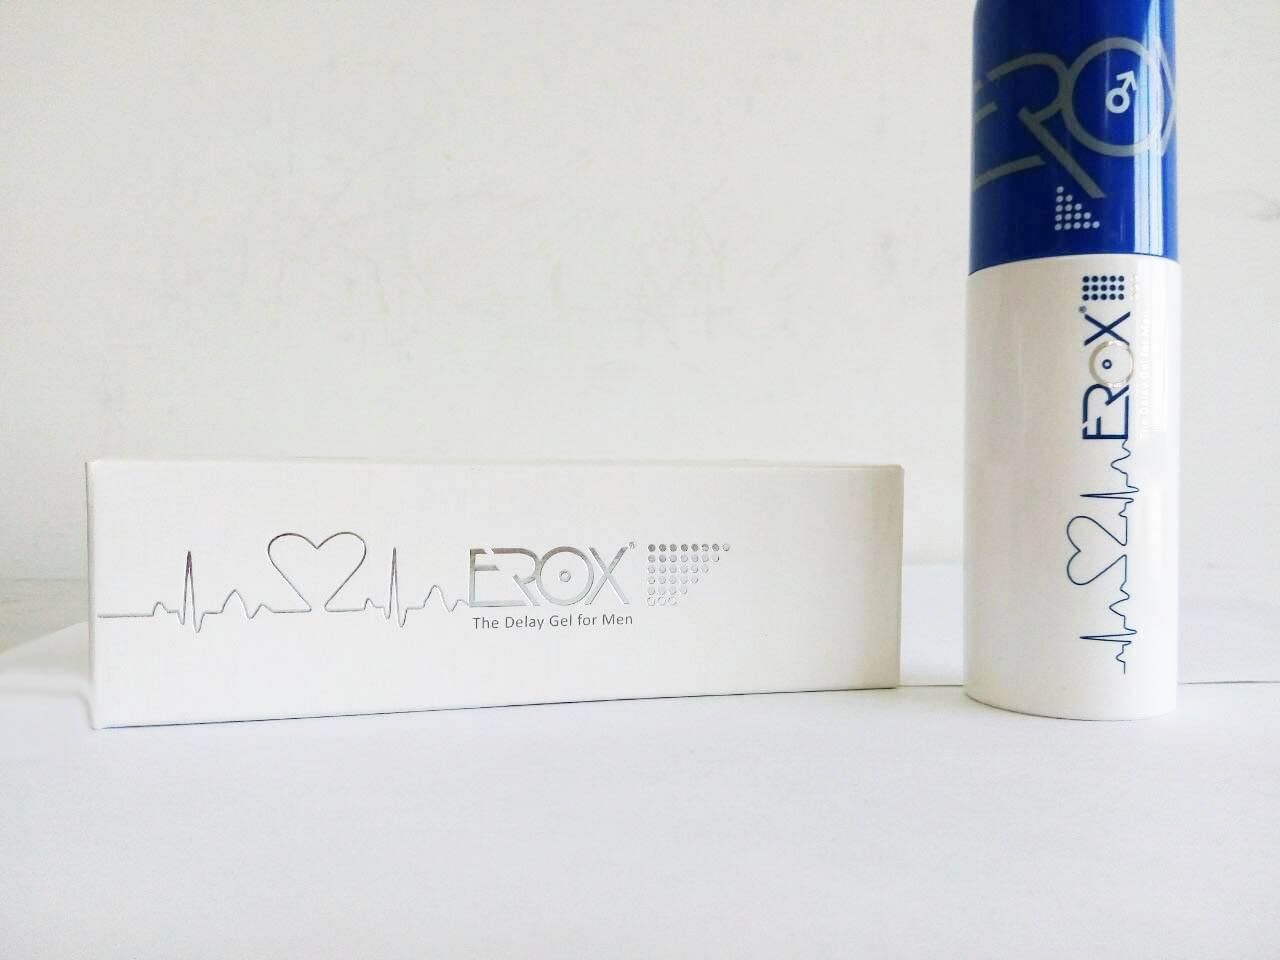 sex product- Delay gel for men